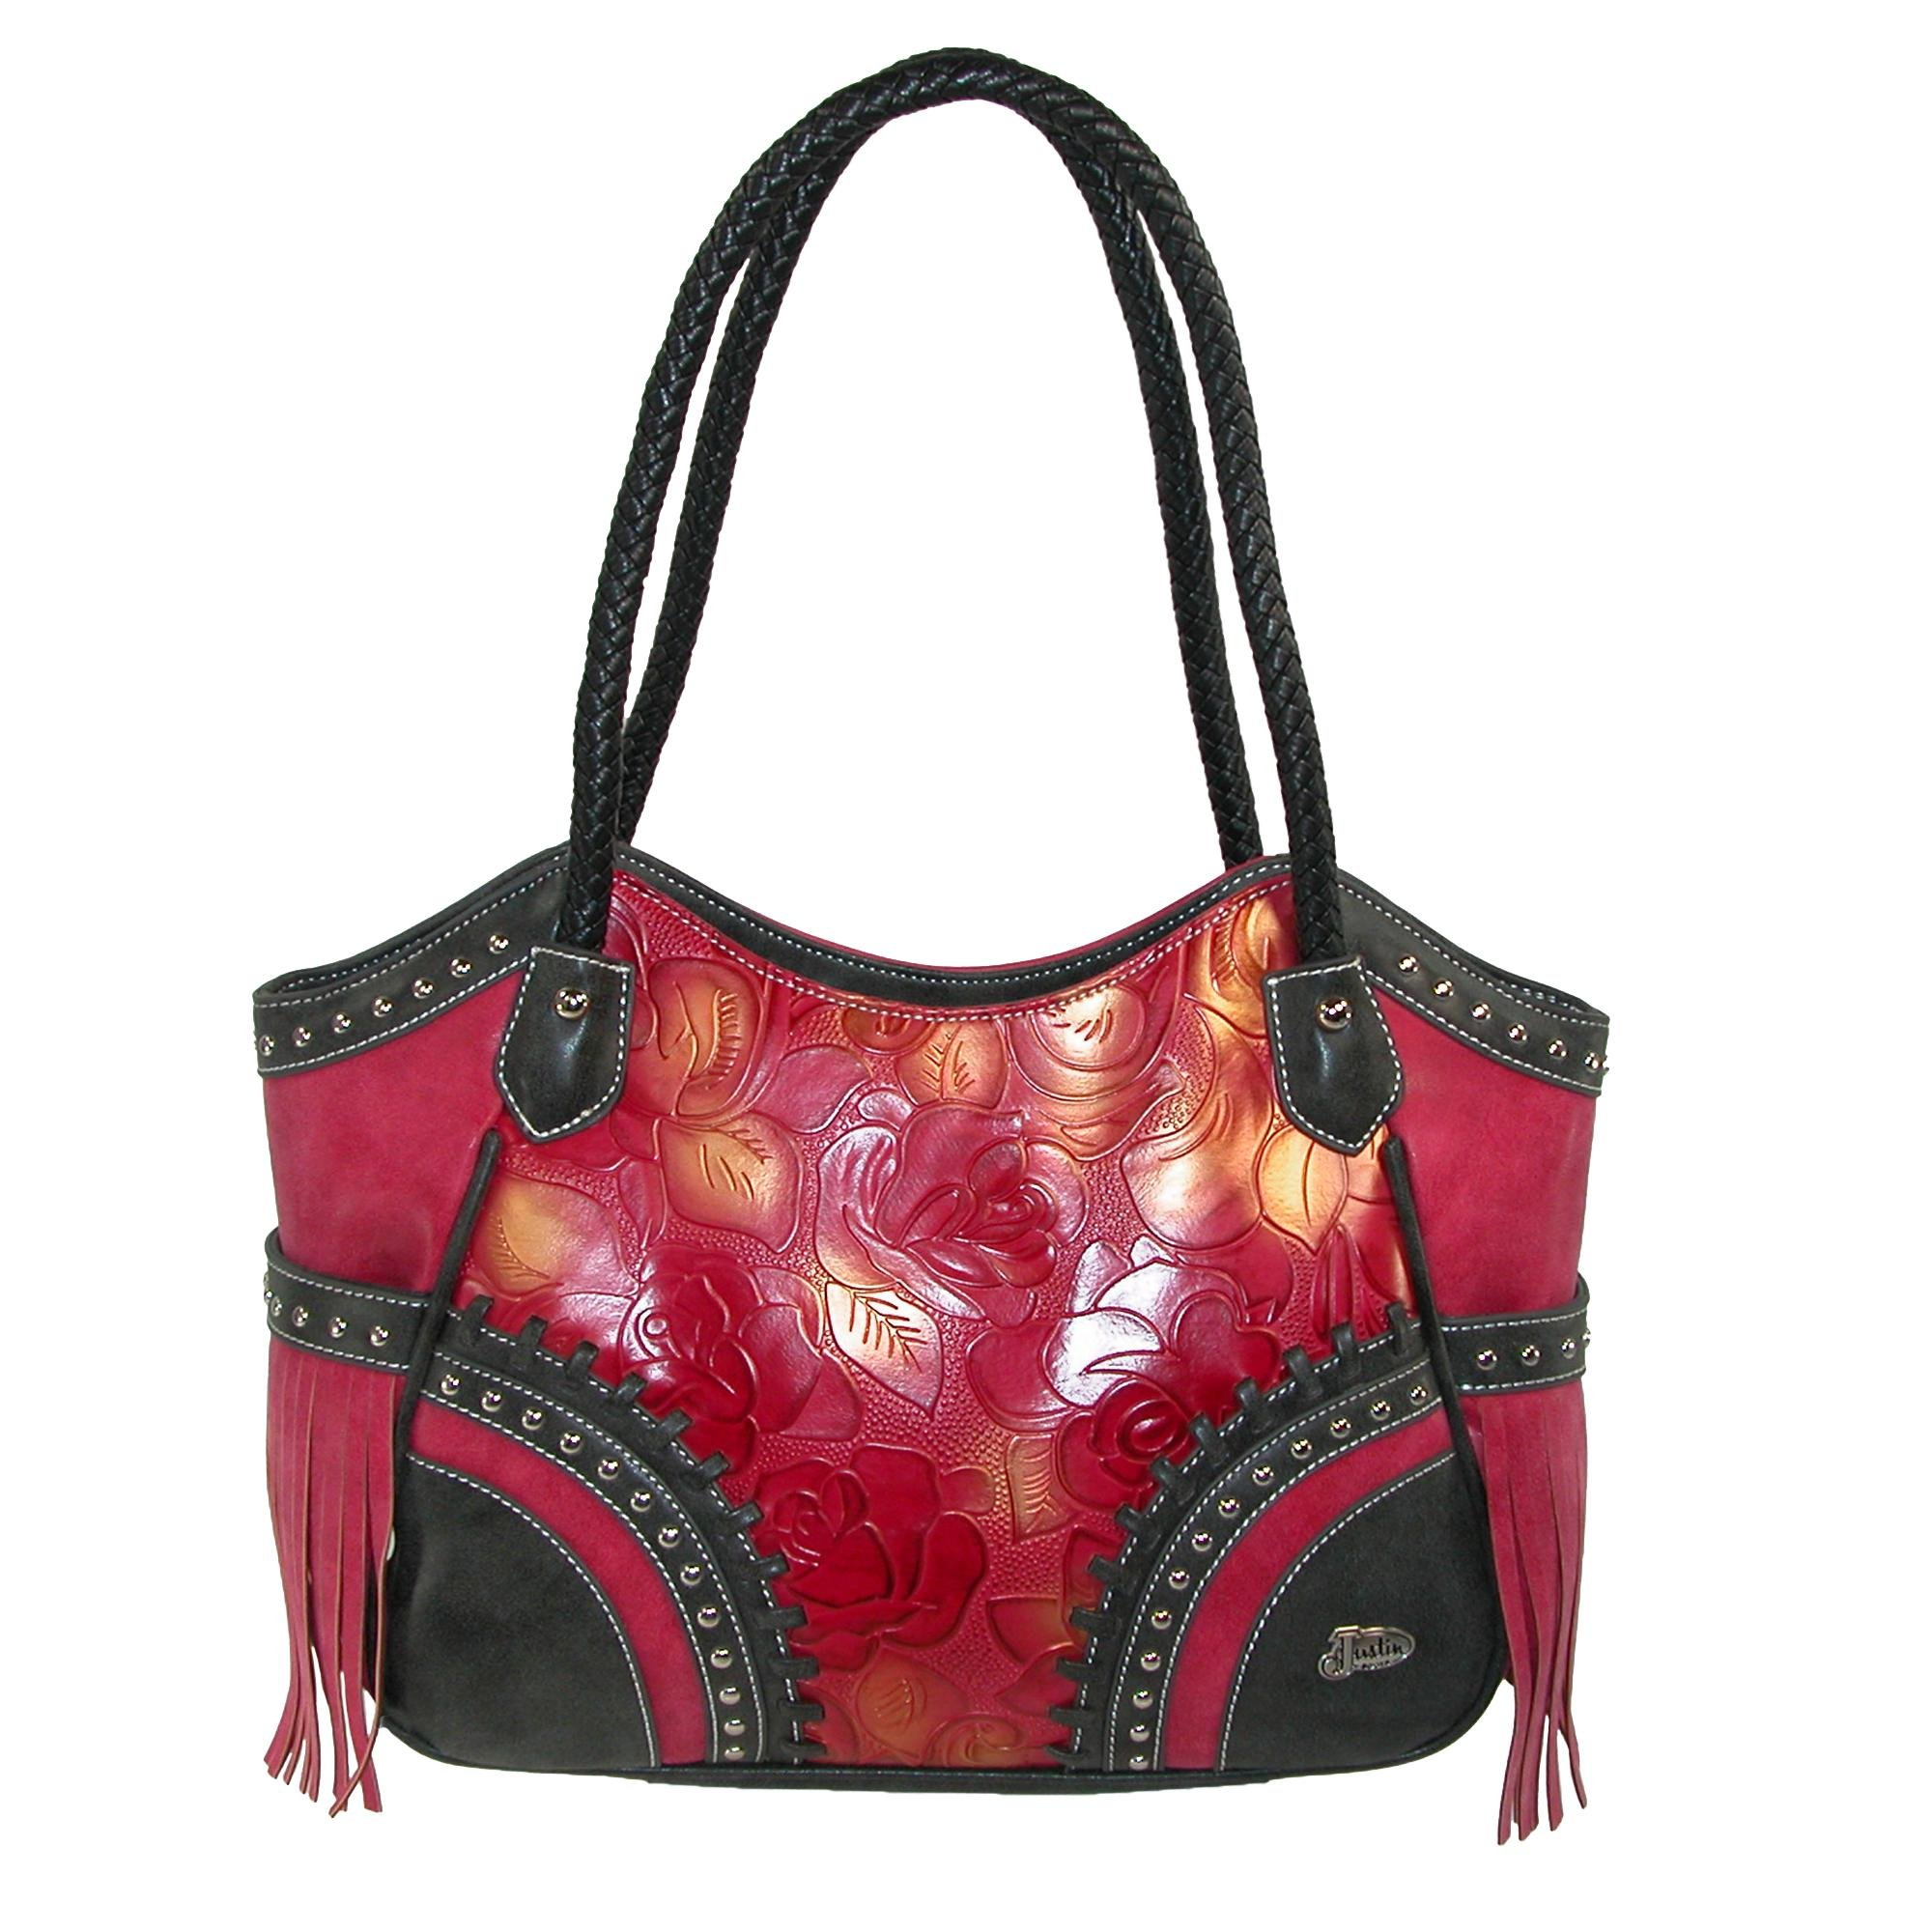 3 D Belt Company Women's Floral Embossed Satchel Bag with Faux Leather Fringe